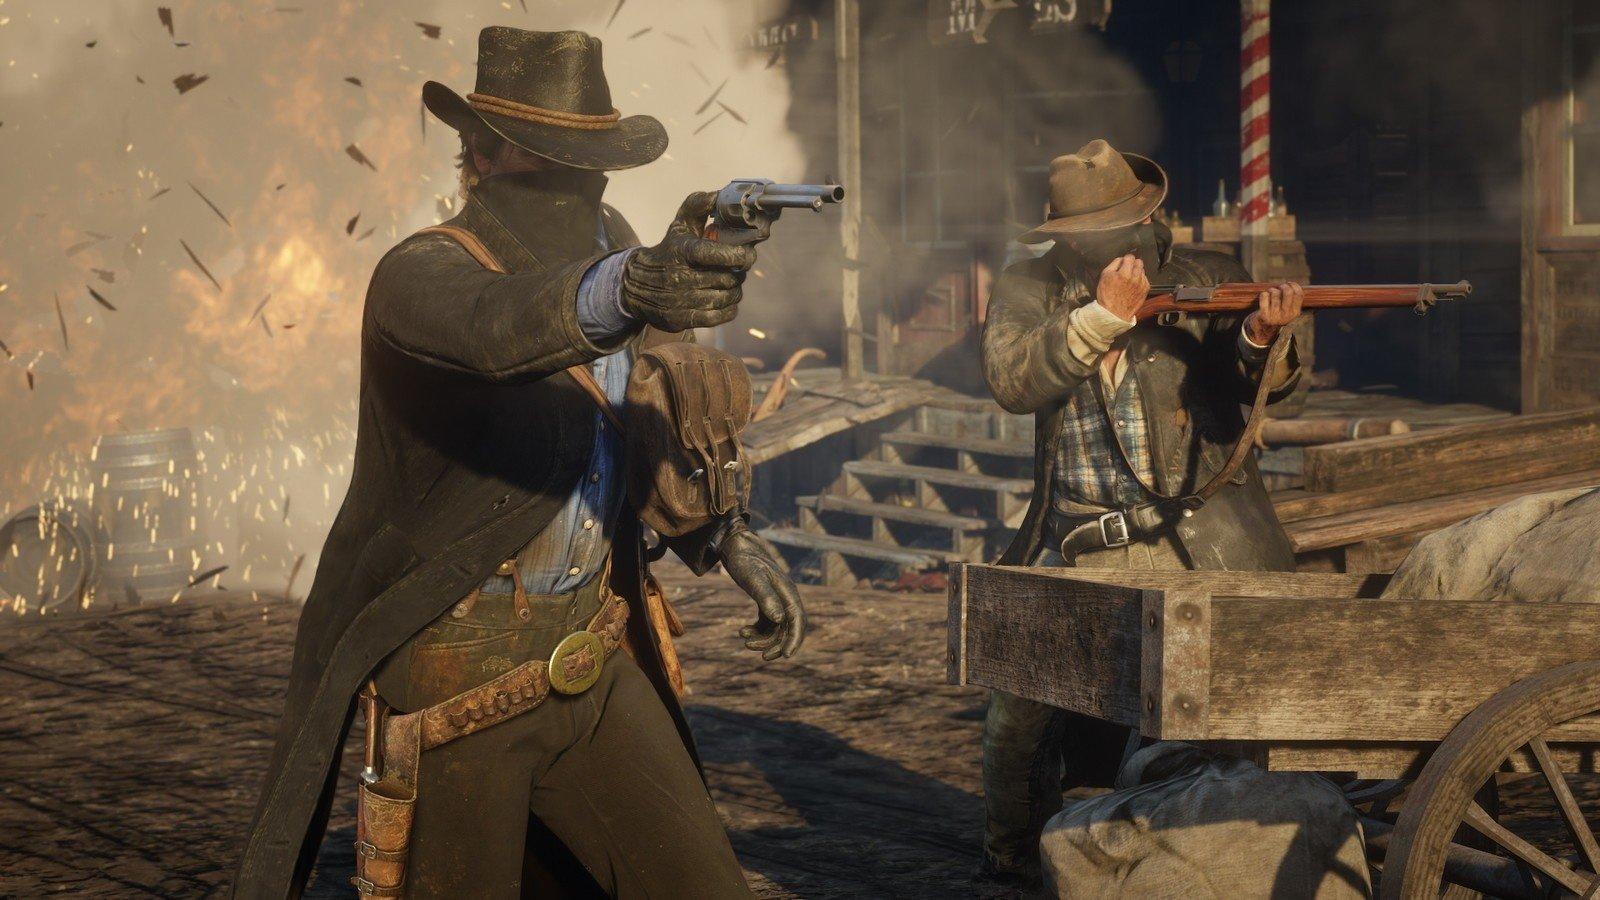 bulletstorm full clip achievement guide